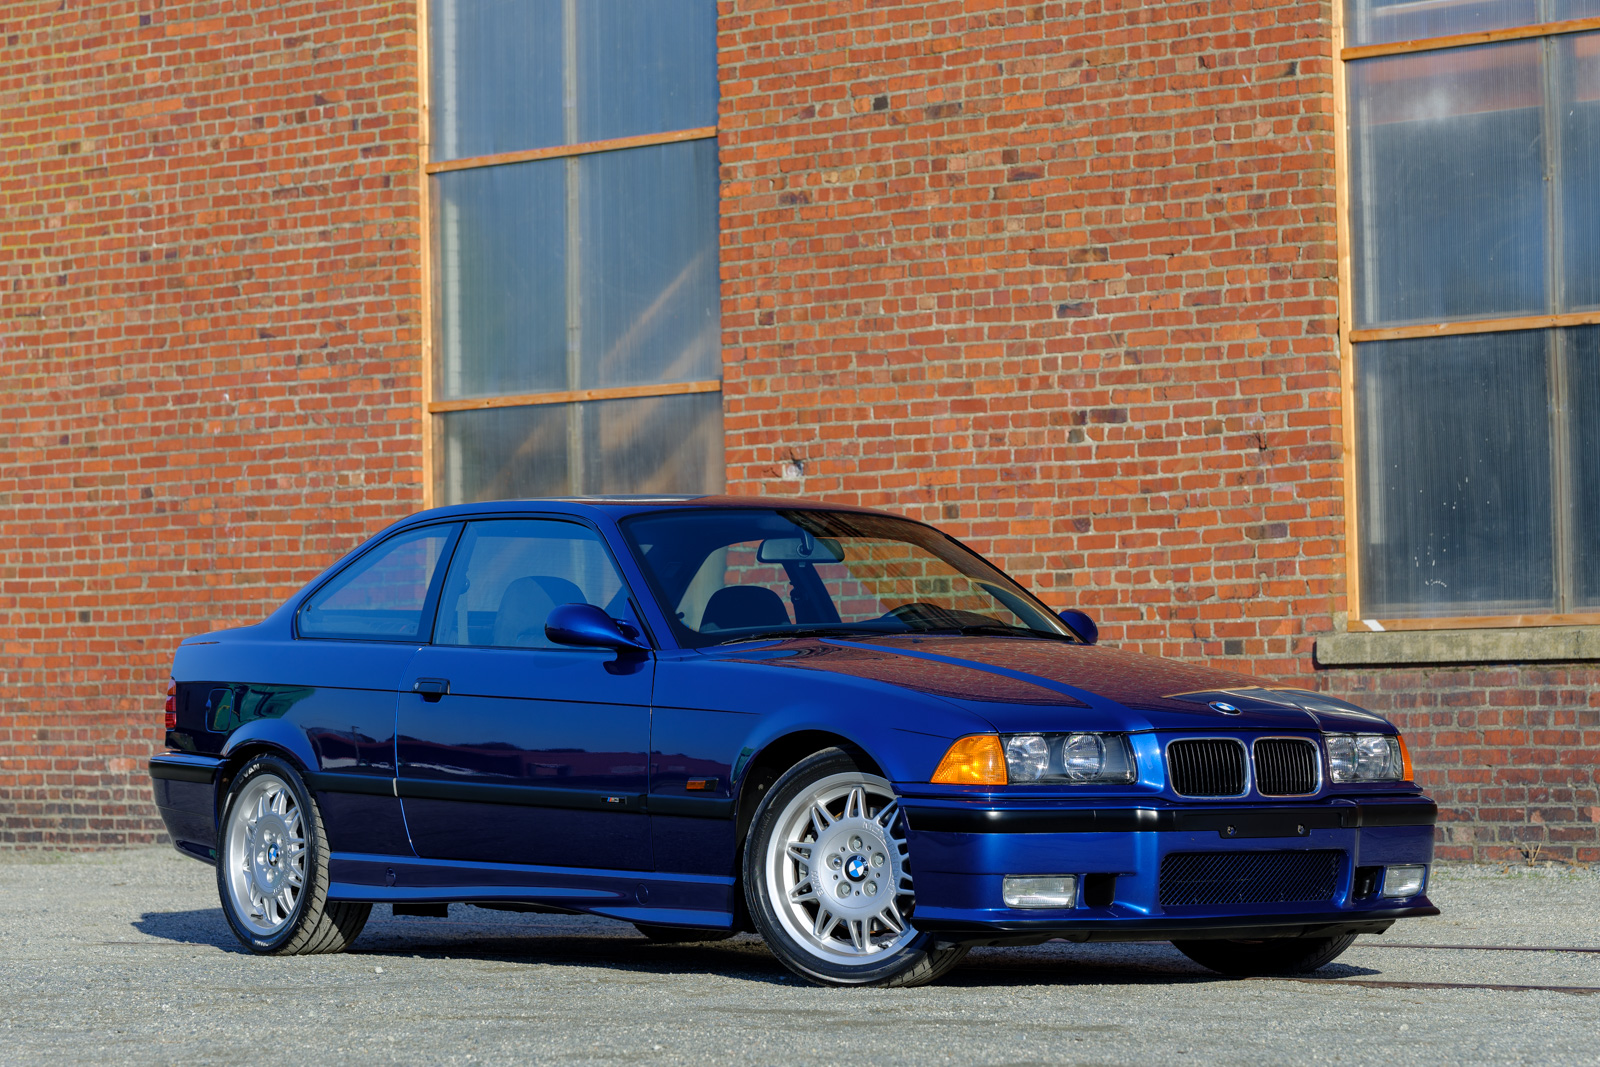 1995 Bmw E36 M3 Coupe Silver Arrow Cars Ltd